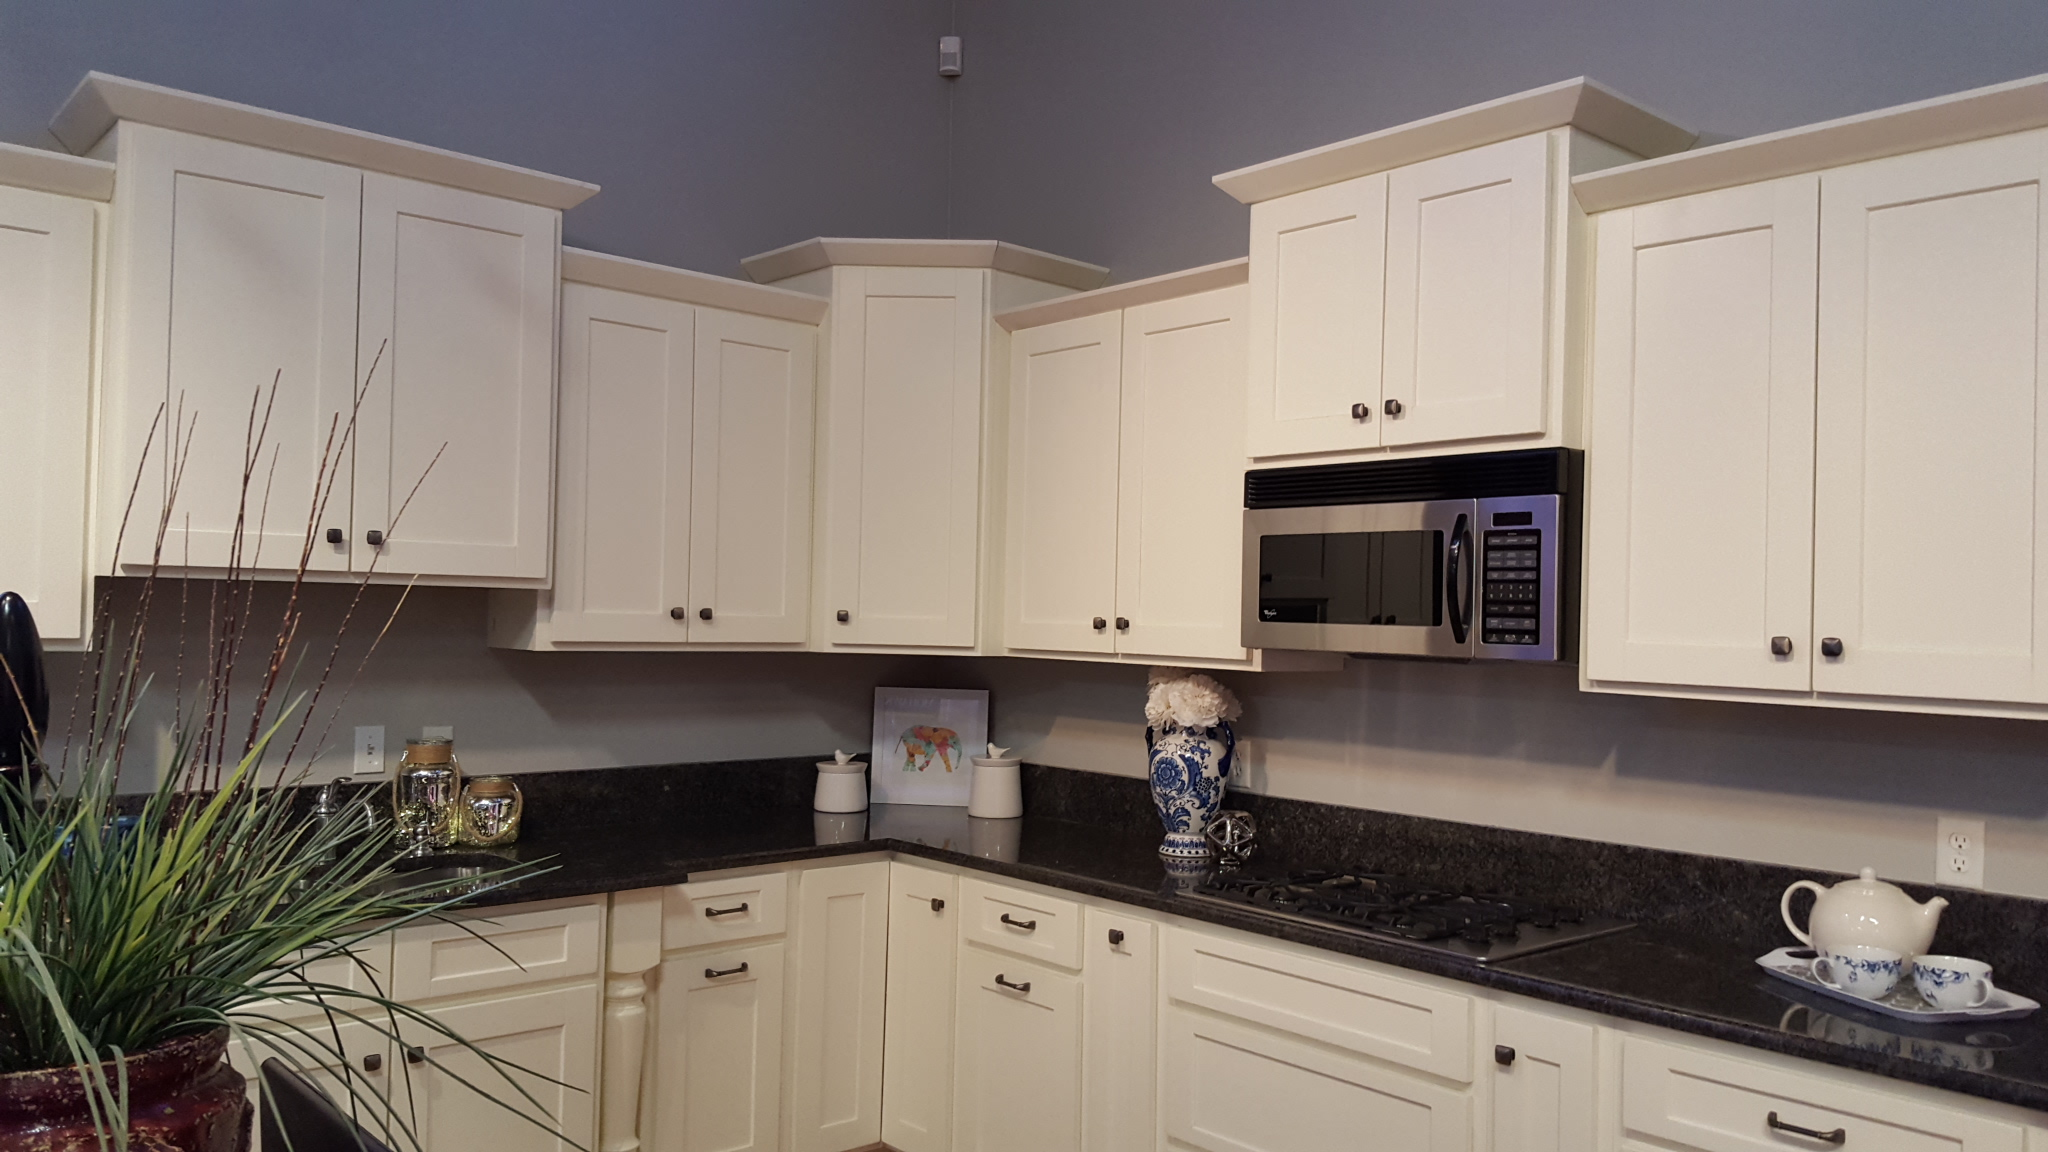 rta kitchen cabinets rta kitchen cabinets Request Sample Request Sample